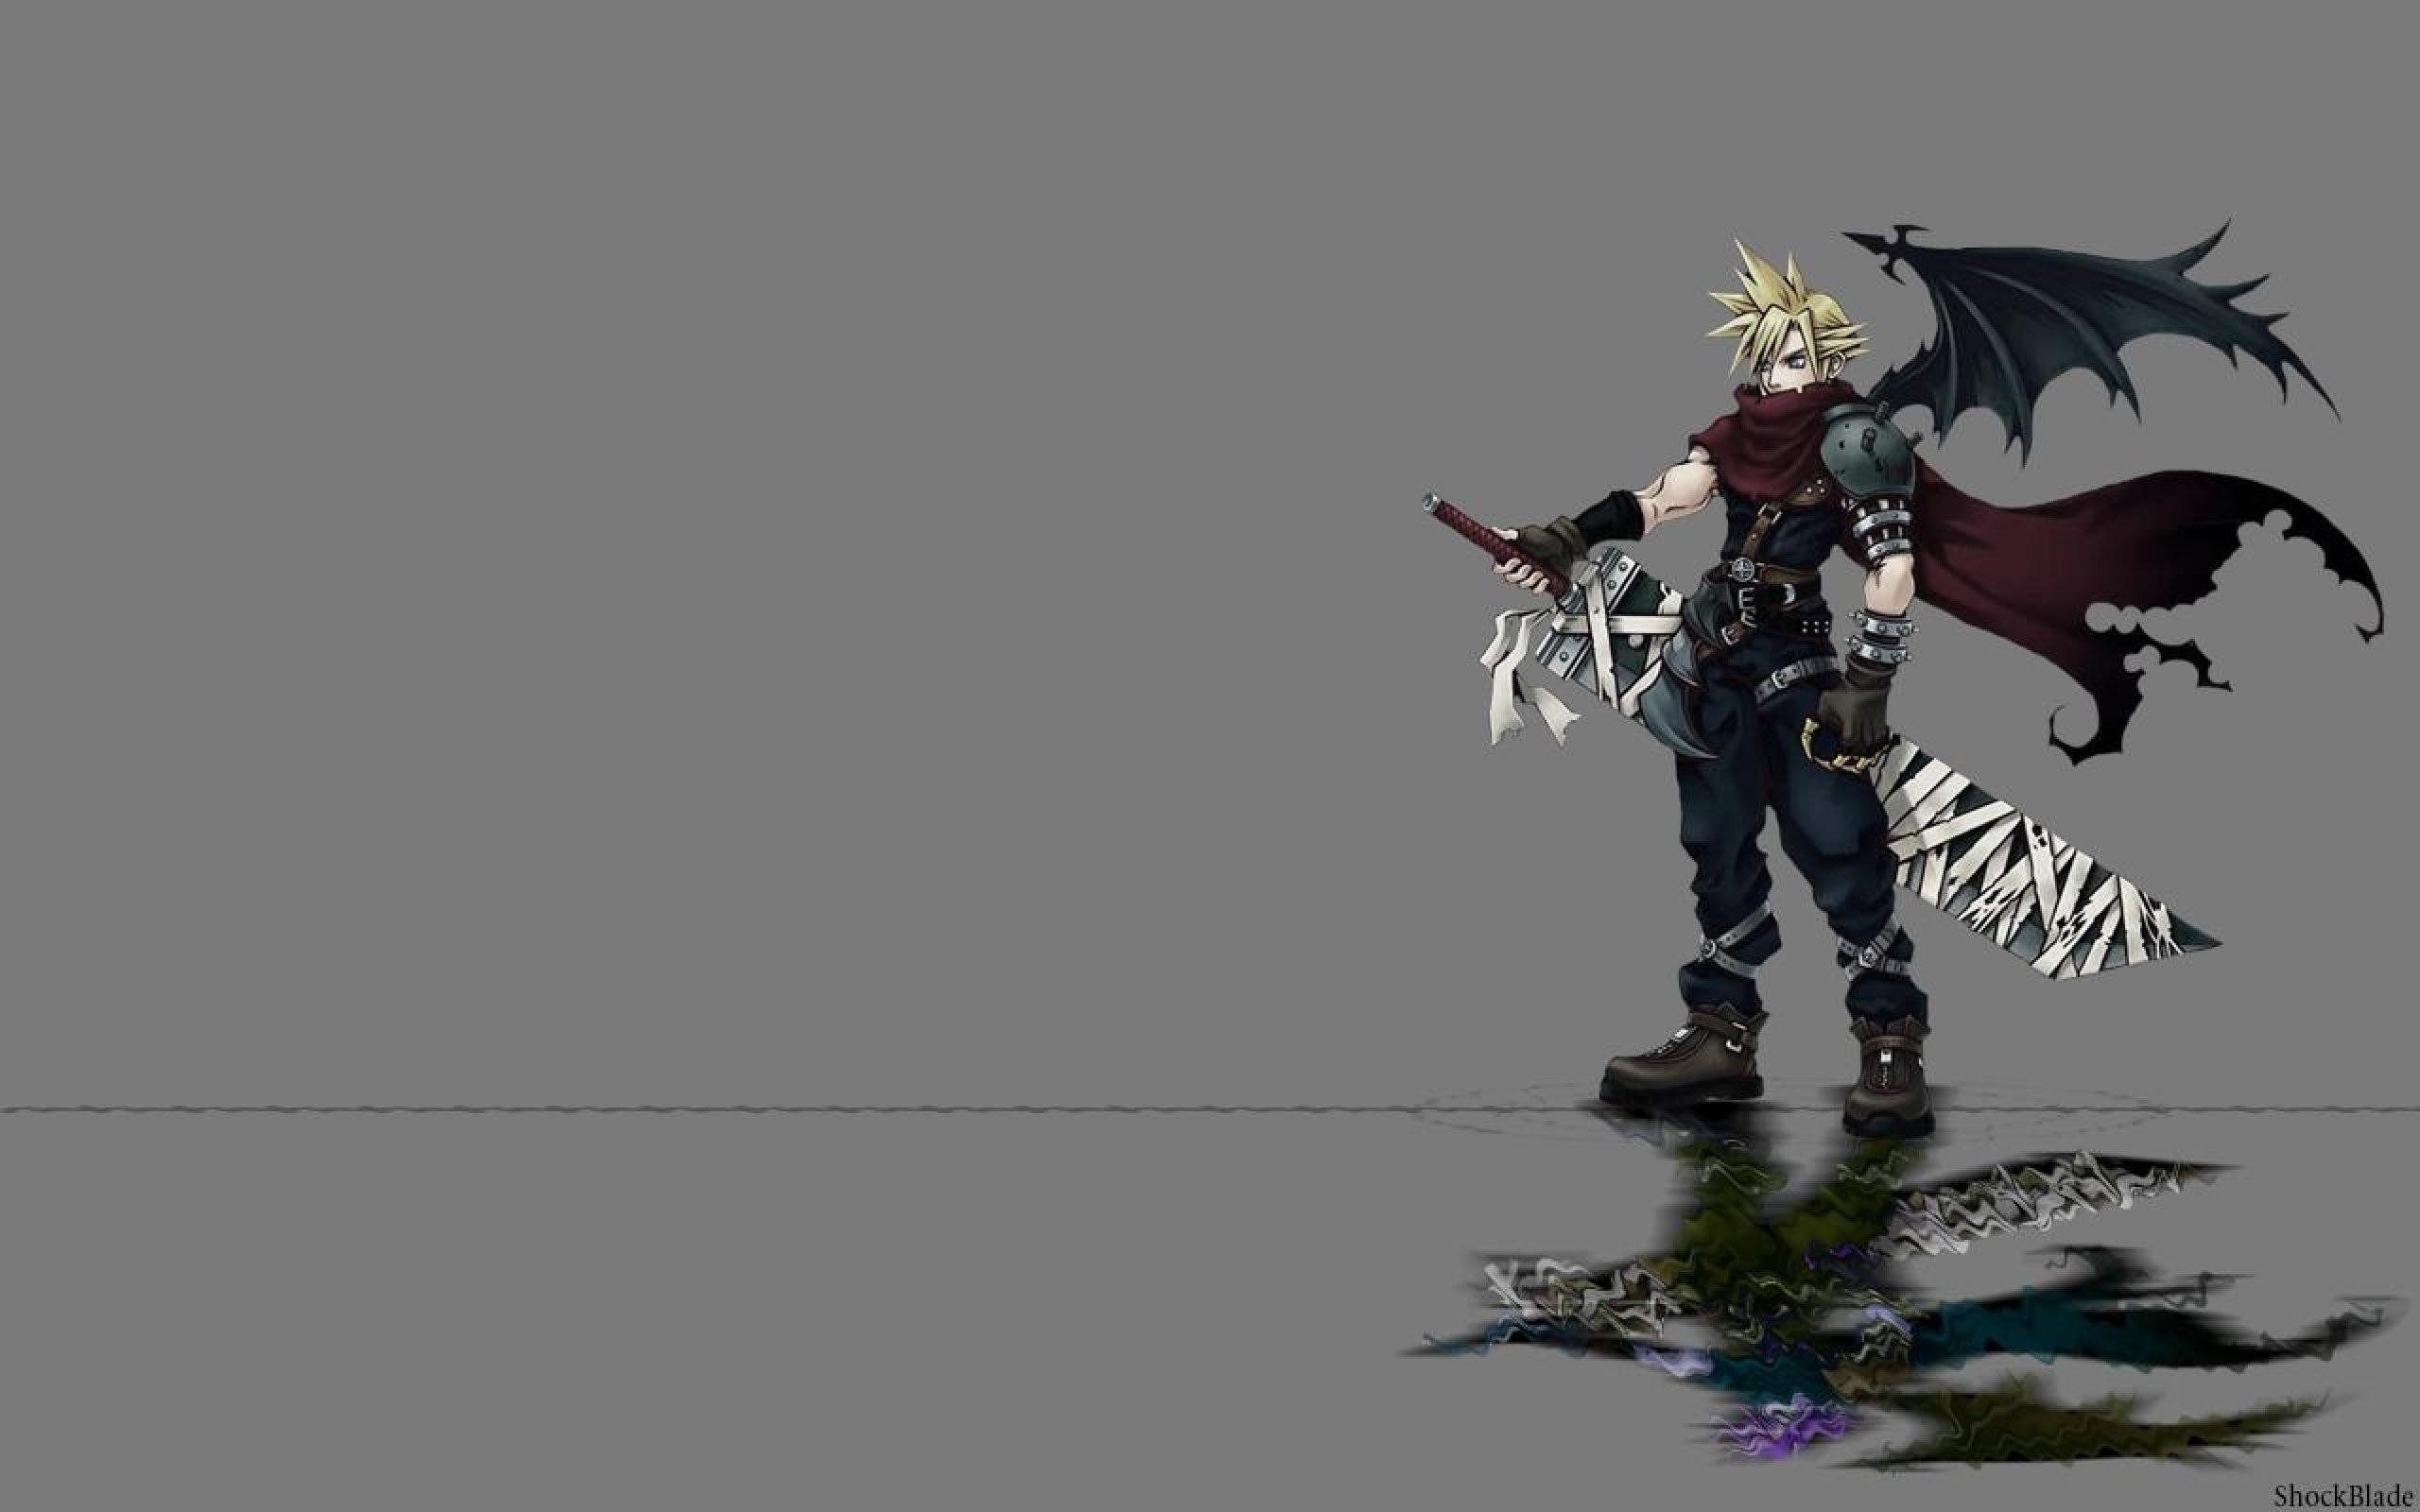 Kingdom Hearts Cloud. SHARE. TAGS: Final Fantasy Games